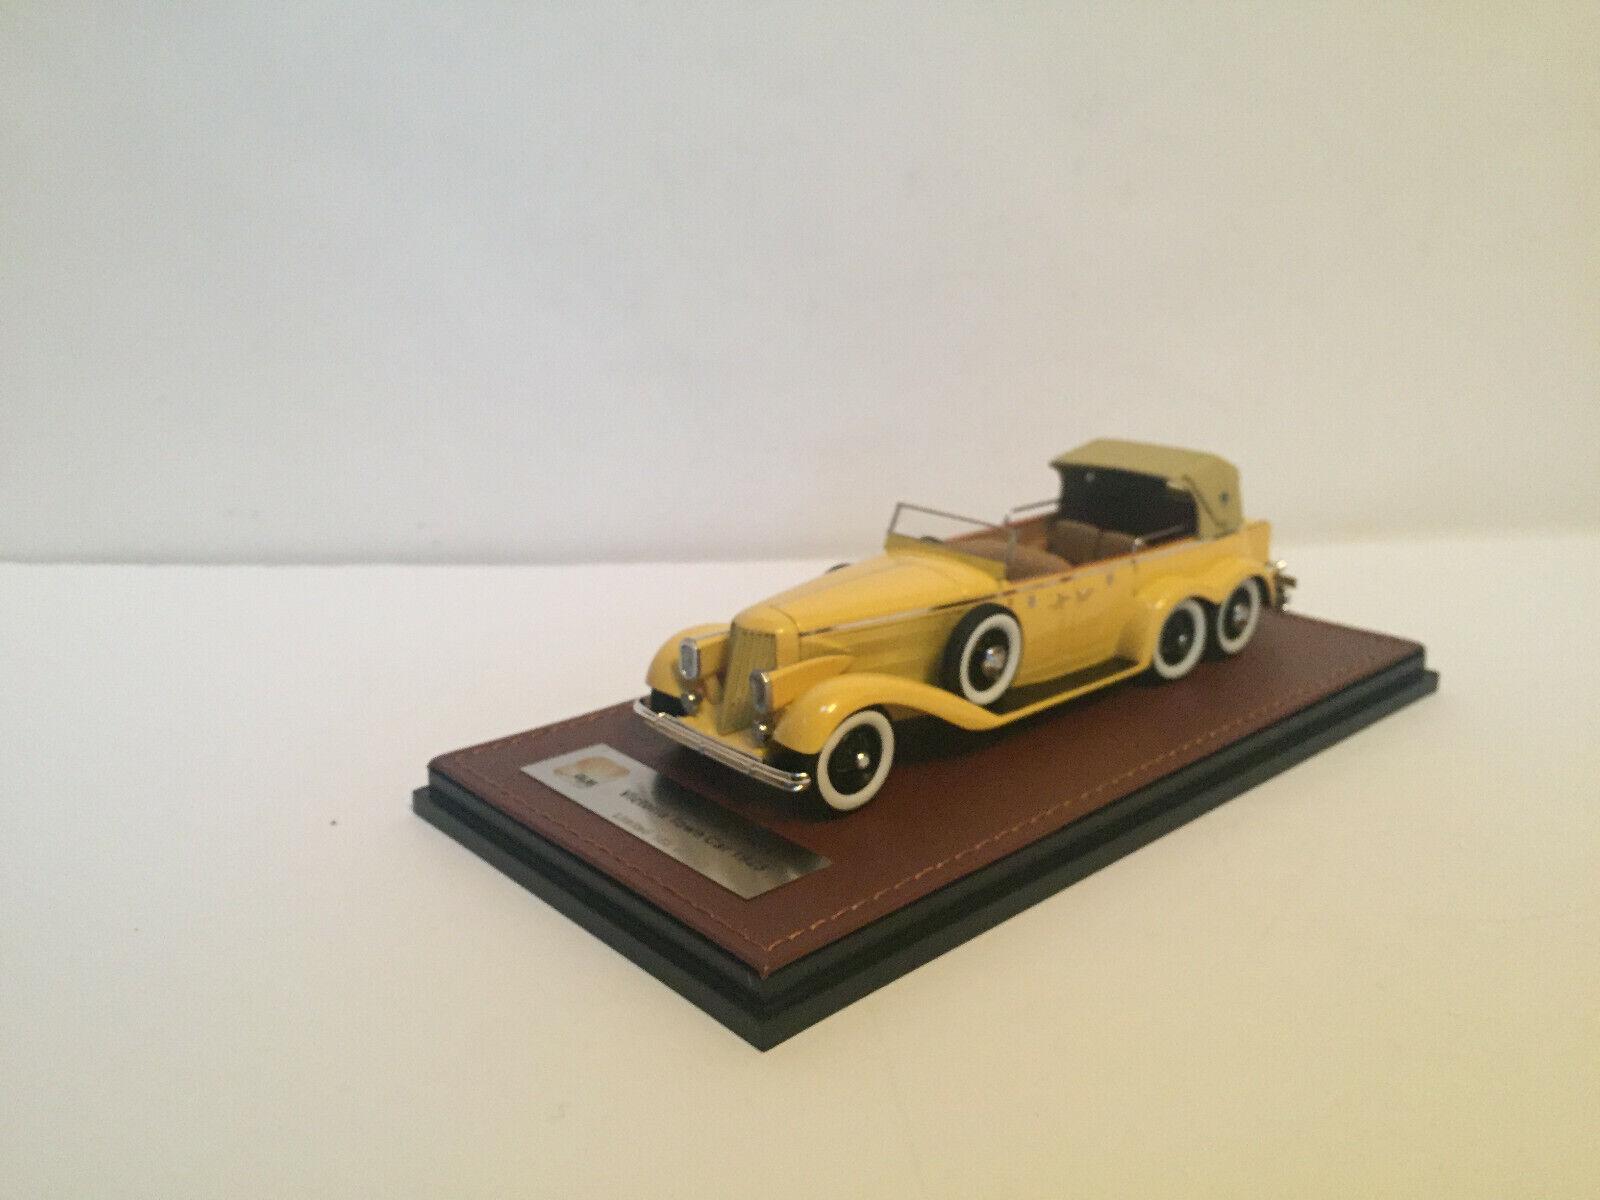 1 43 1923 Hispano-Suiza H6A Viktoria City Car Top Verkleidung Glm